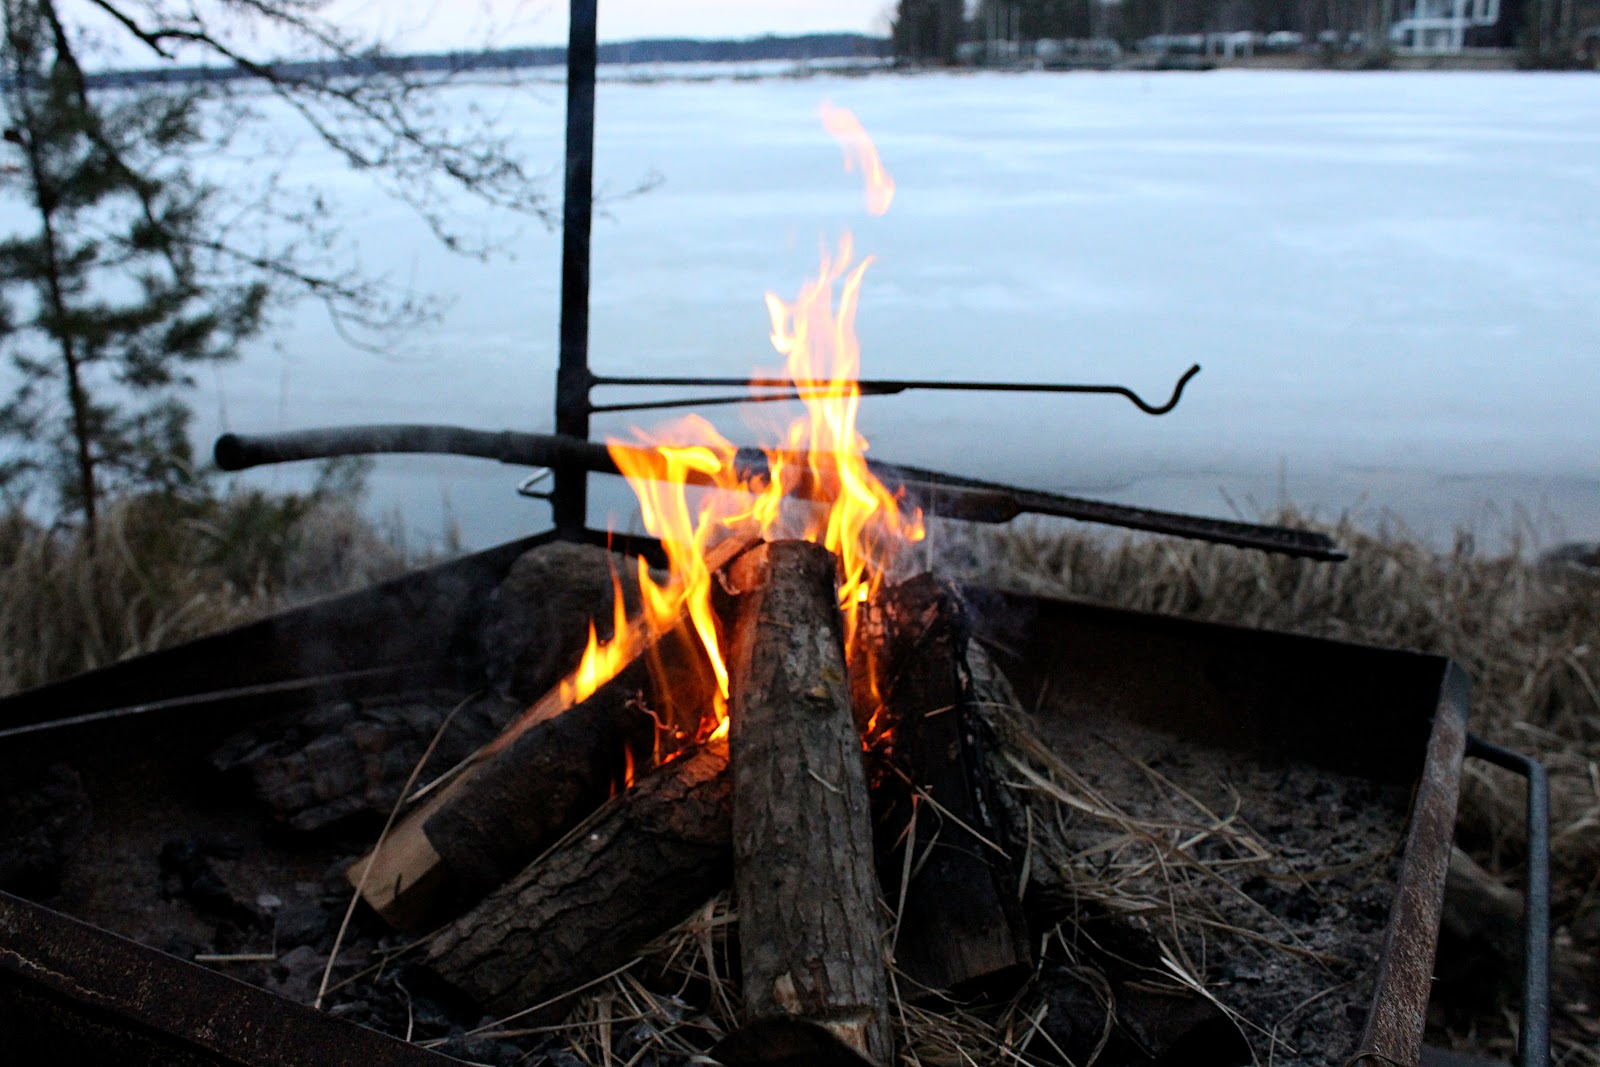 lake Paijanne, Padasjoki, Villa Paapuuri, Kiuasniemi Villas, lake, water, Finland, Finnish sauna, fire